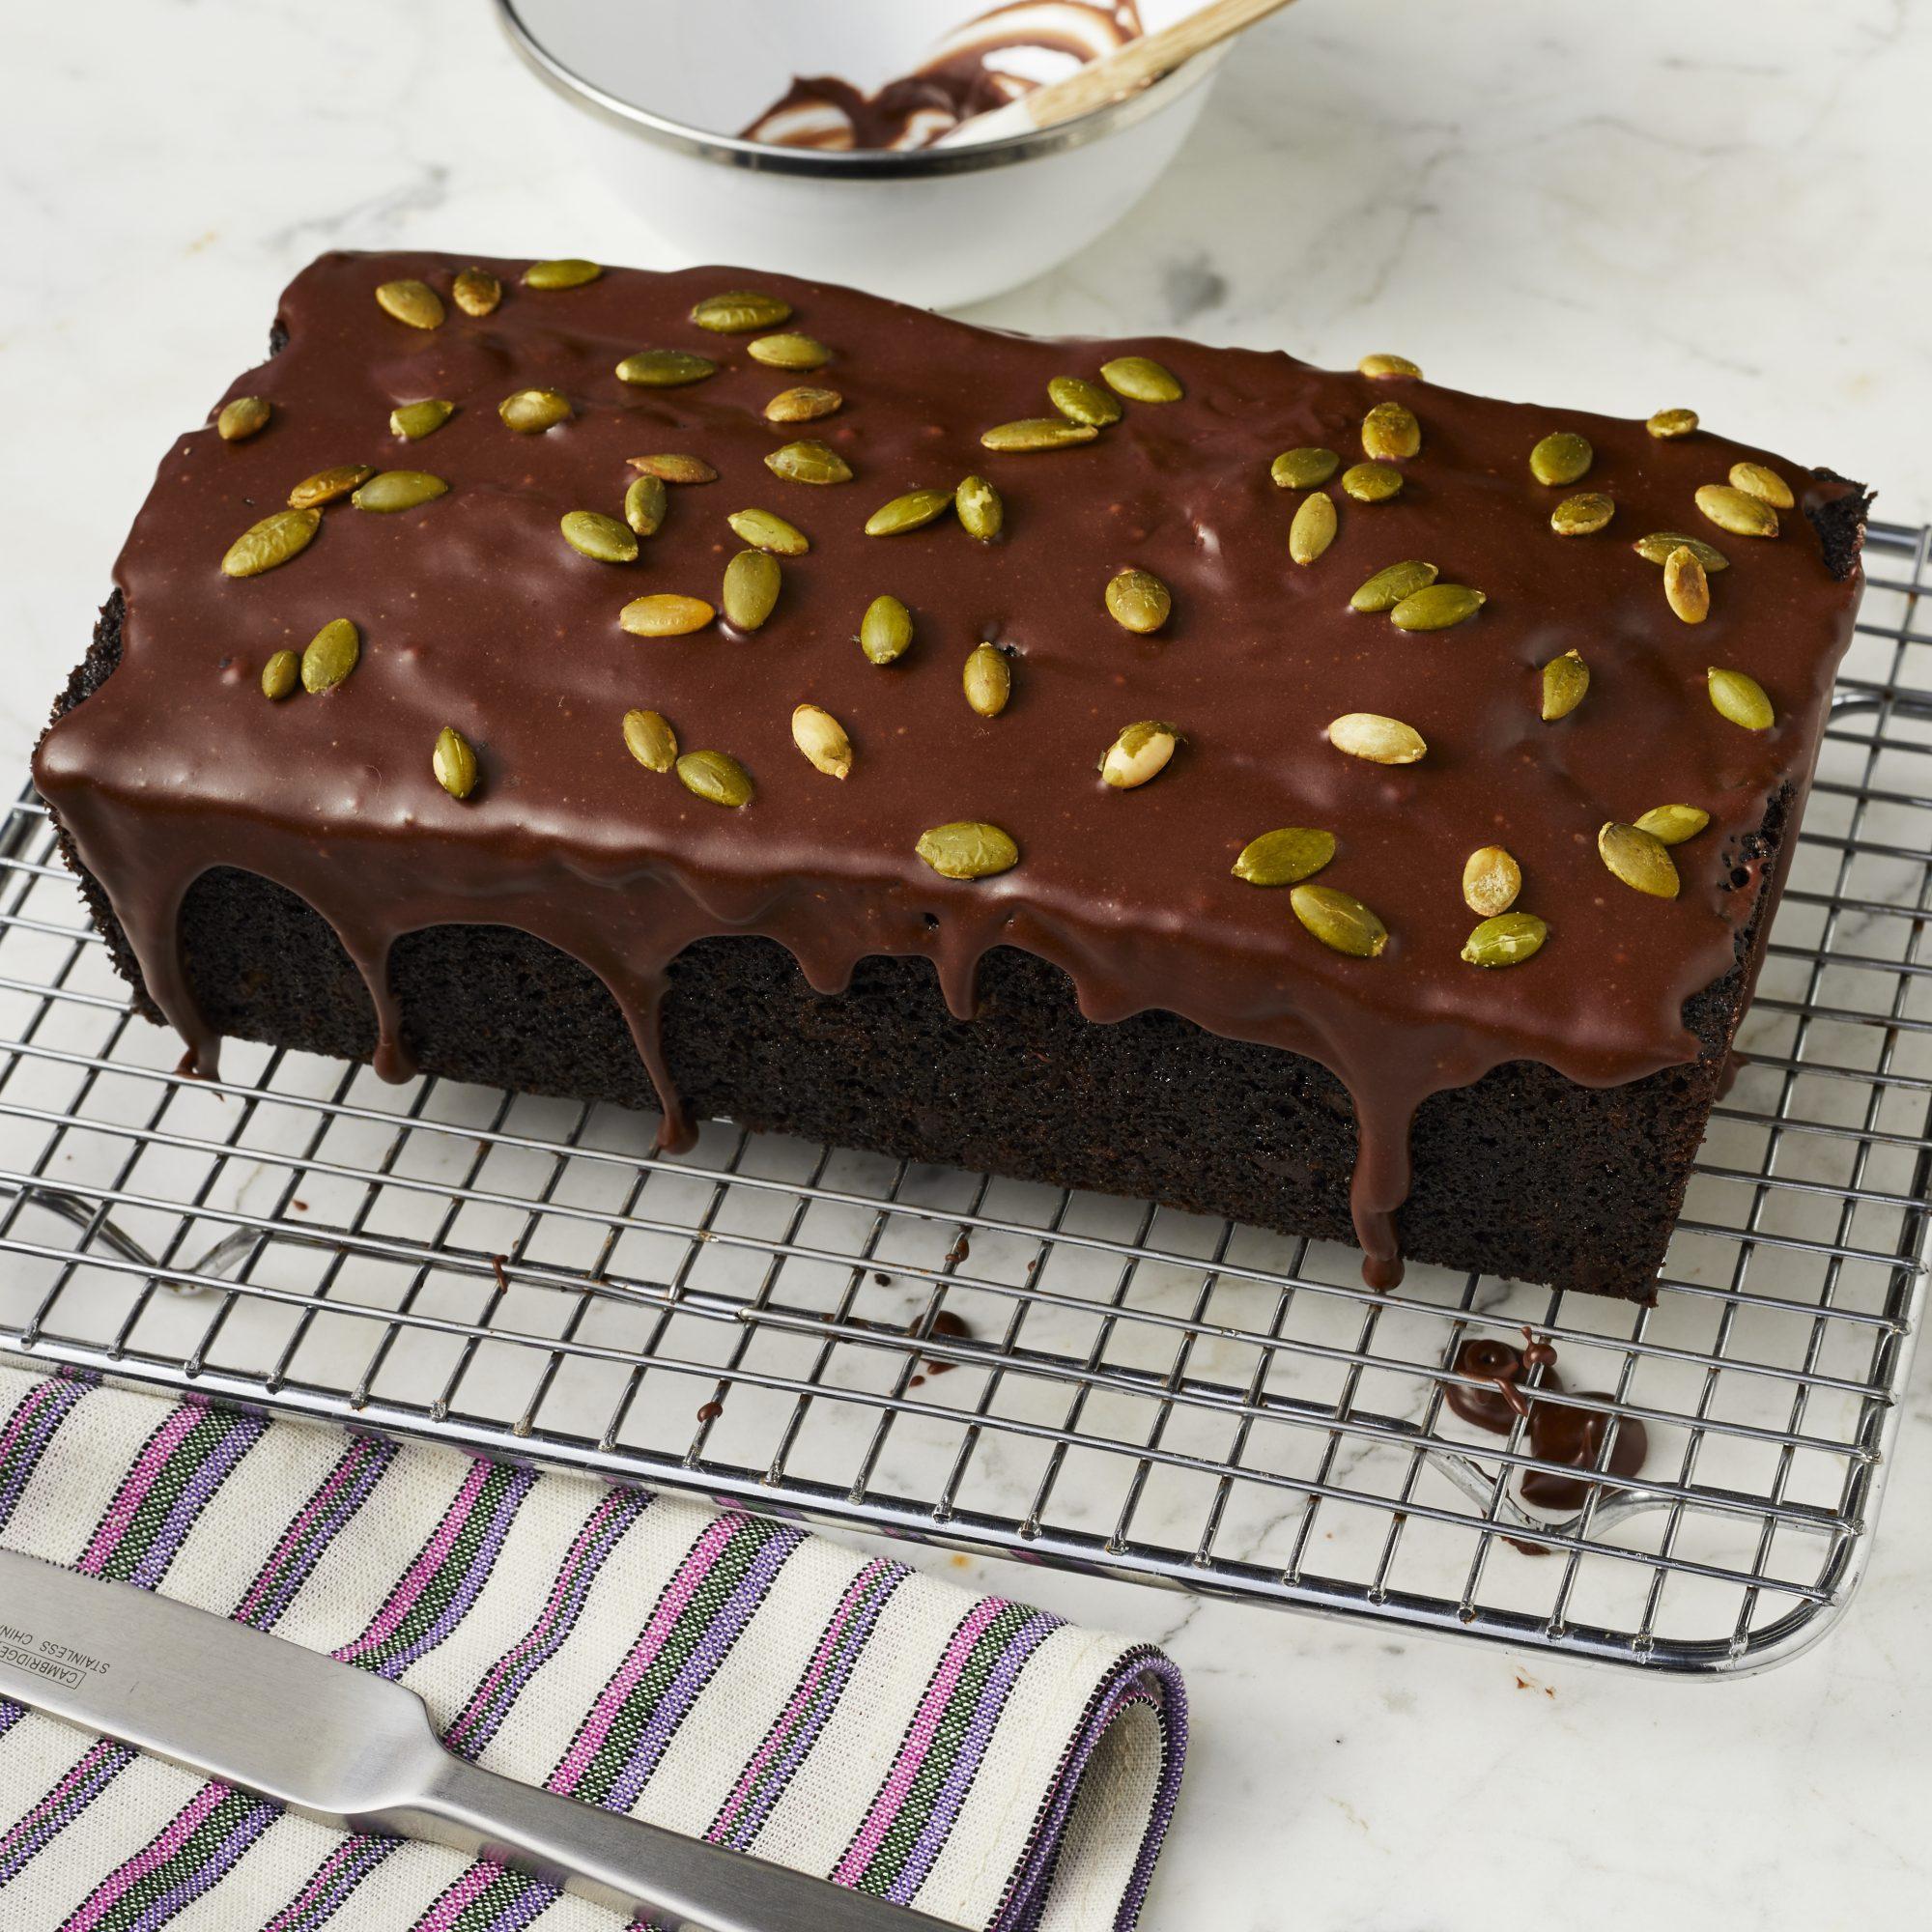 Our Dessert Guru's Top 3 Pieces of Baking Advice